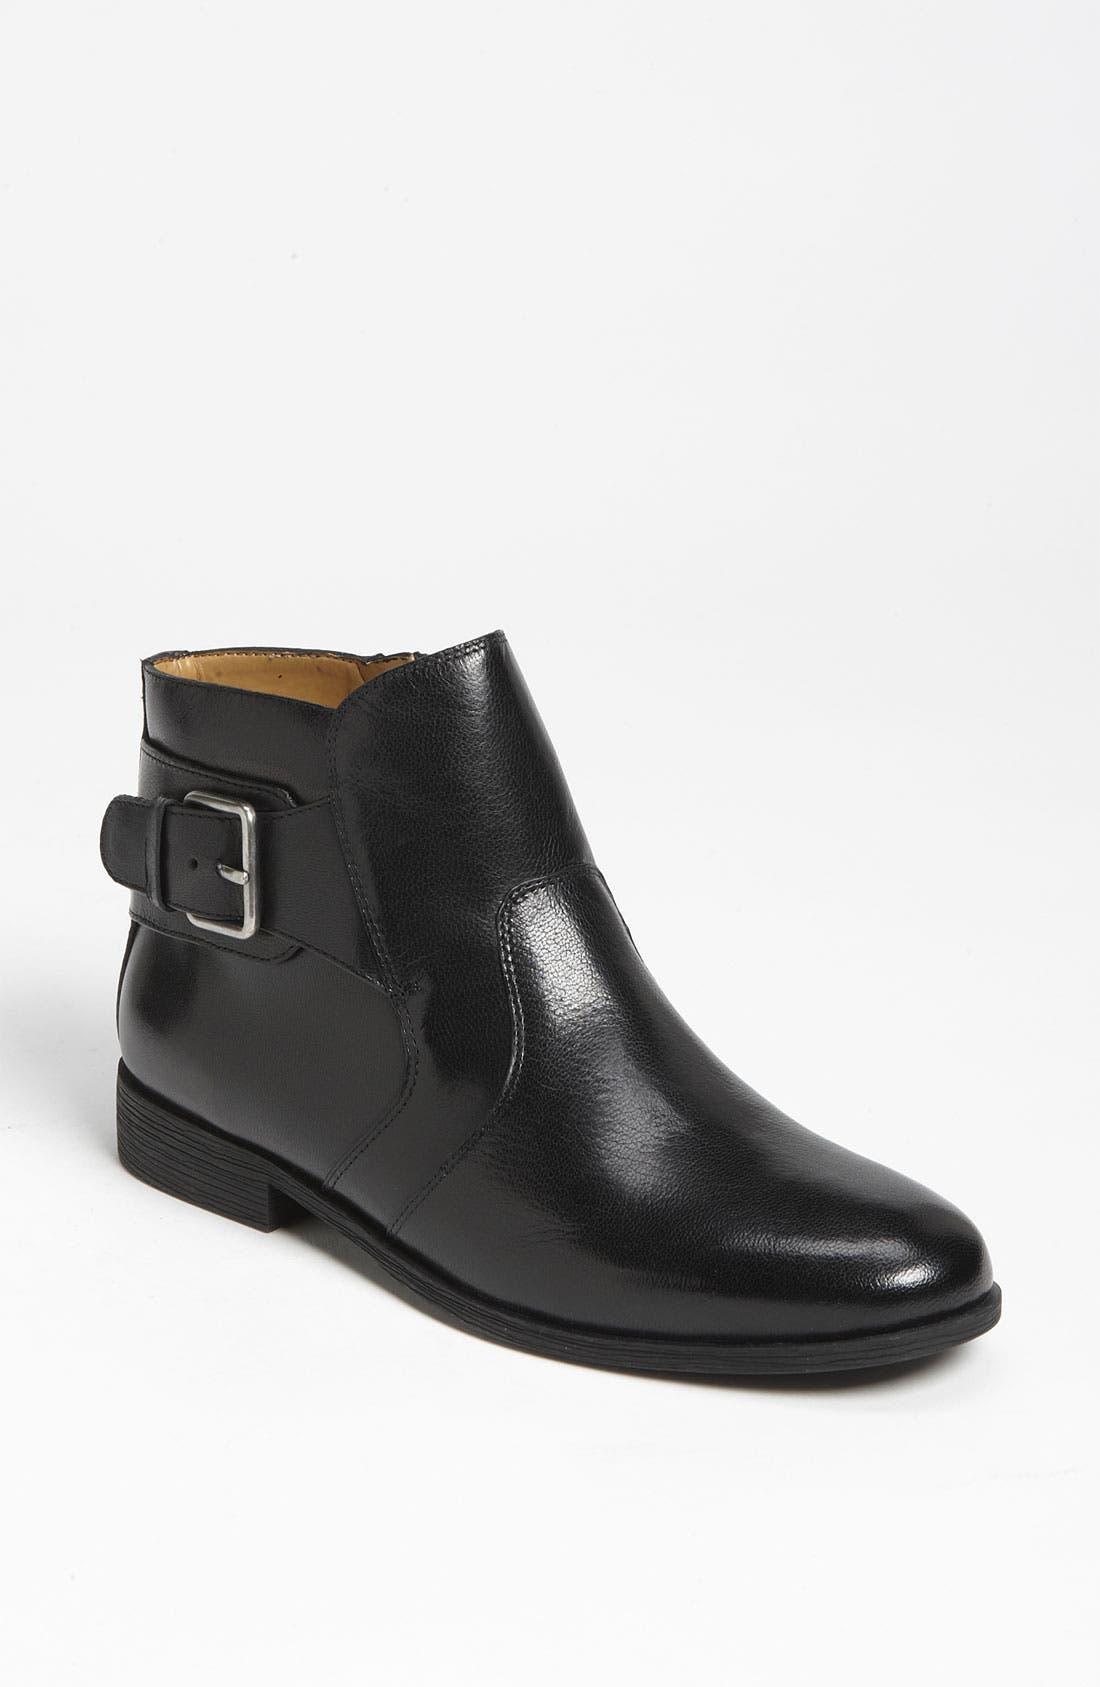 Main Image - Nine West 'Toughenup' Short Boot